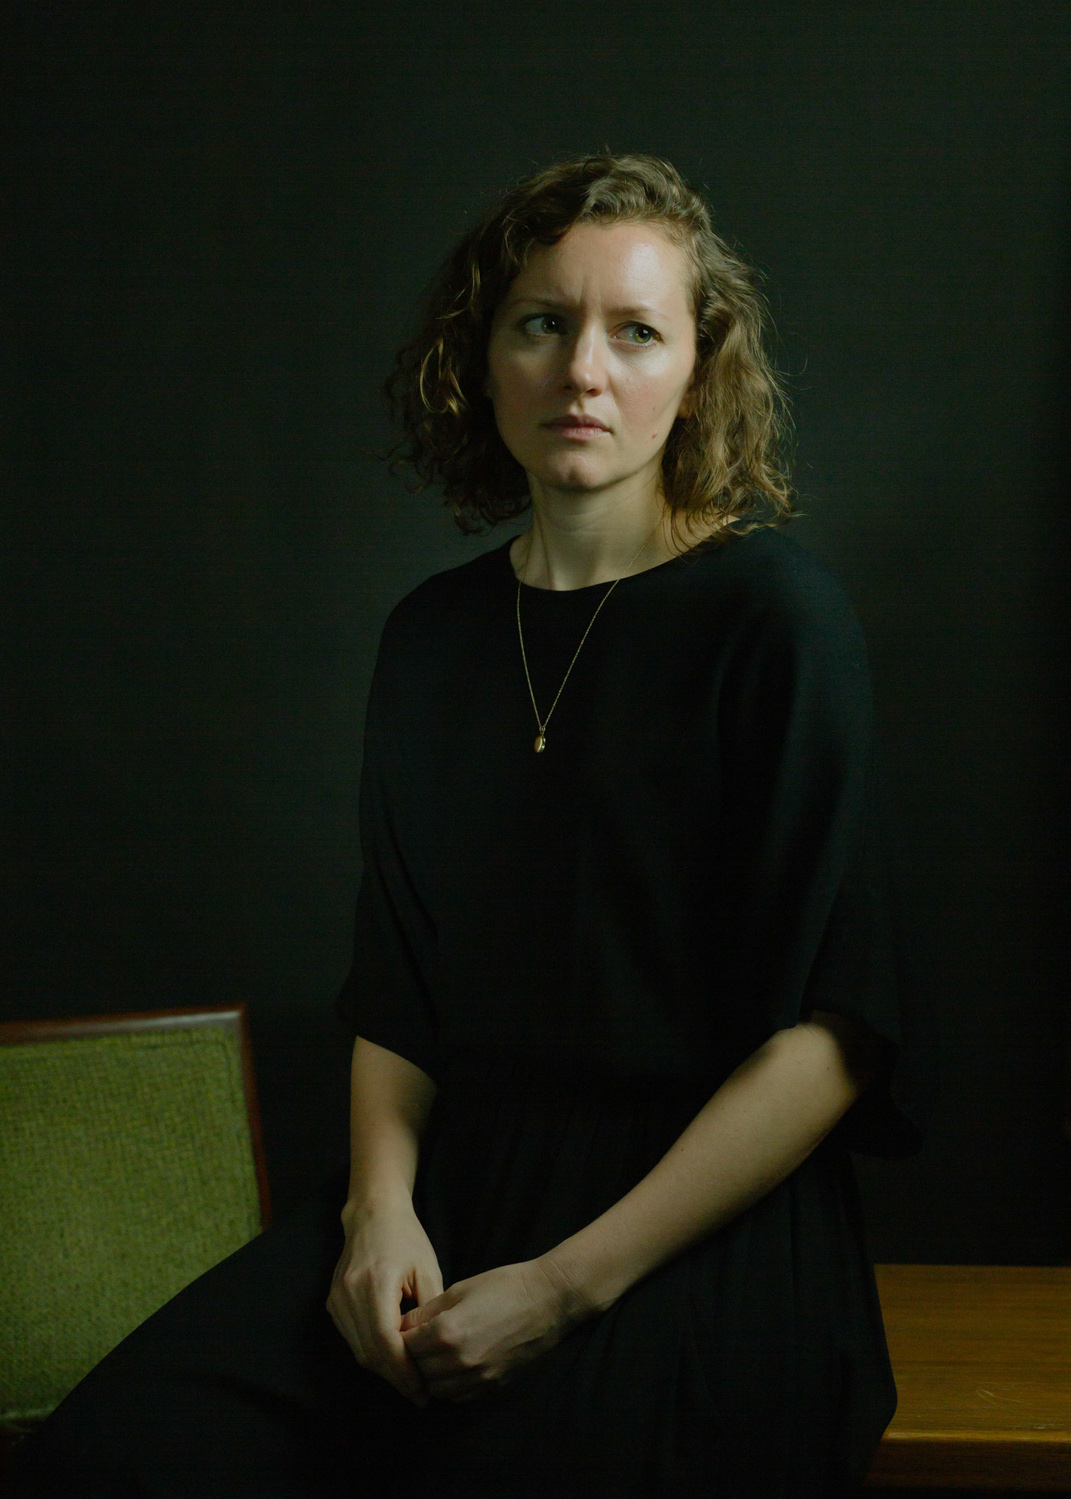 Jean Hartig, Poet, 2017